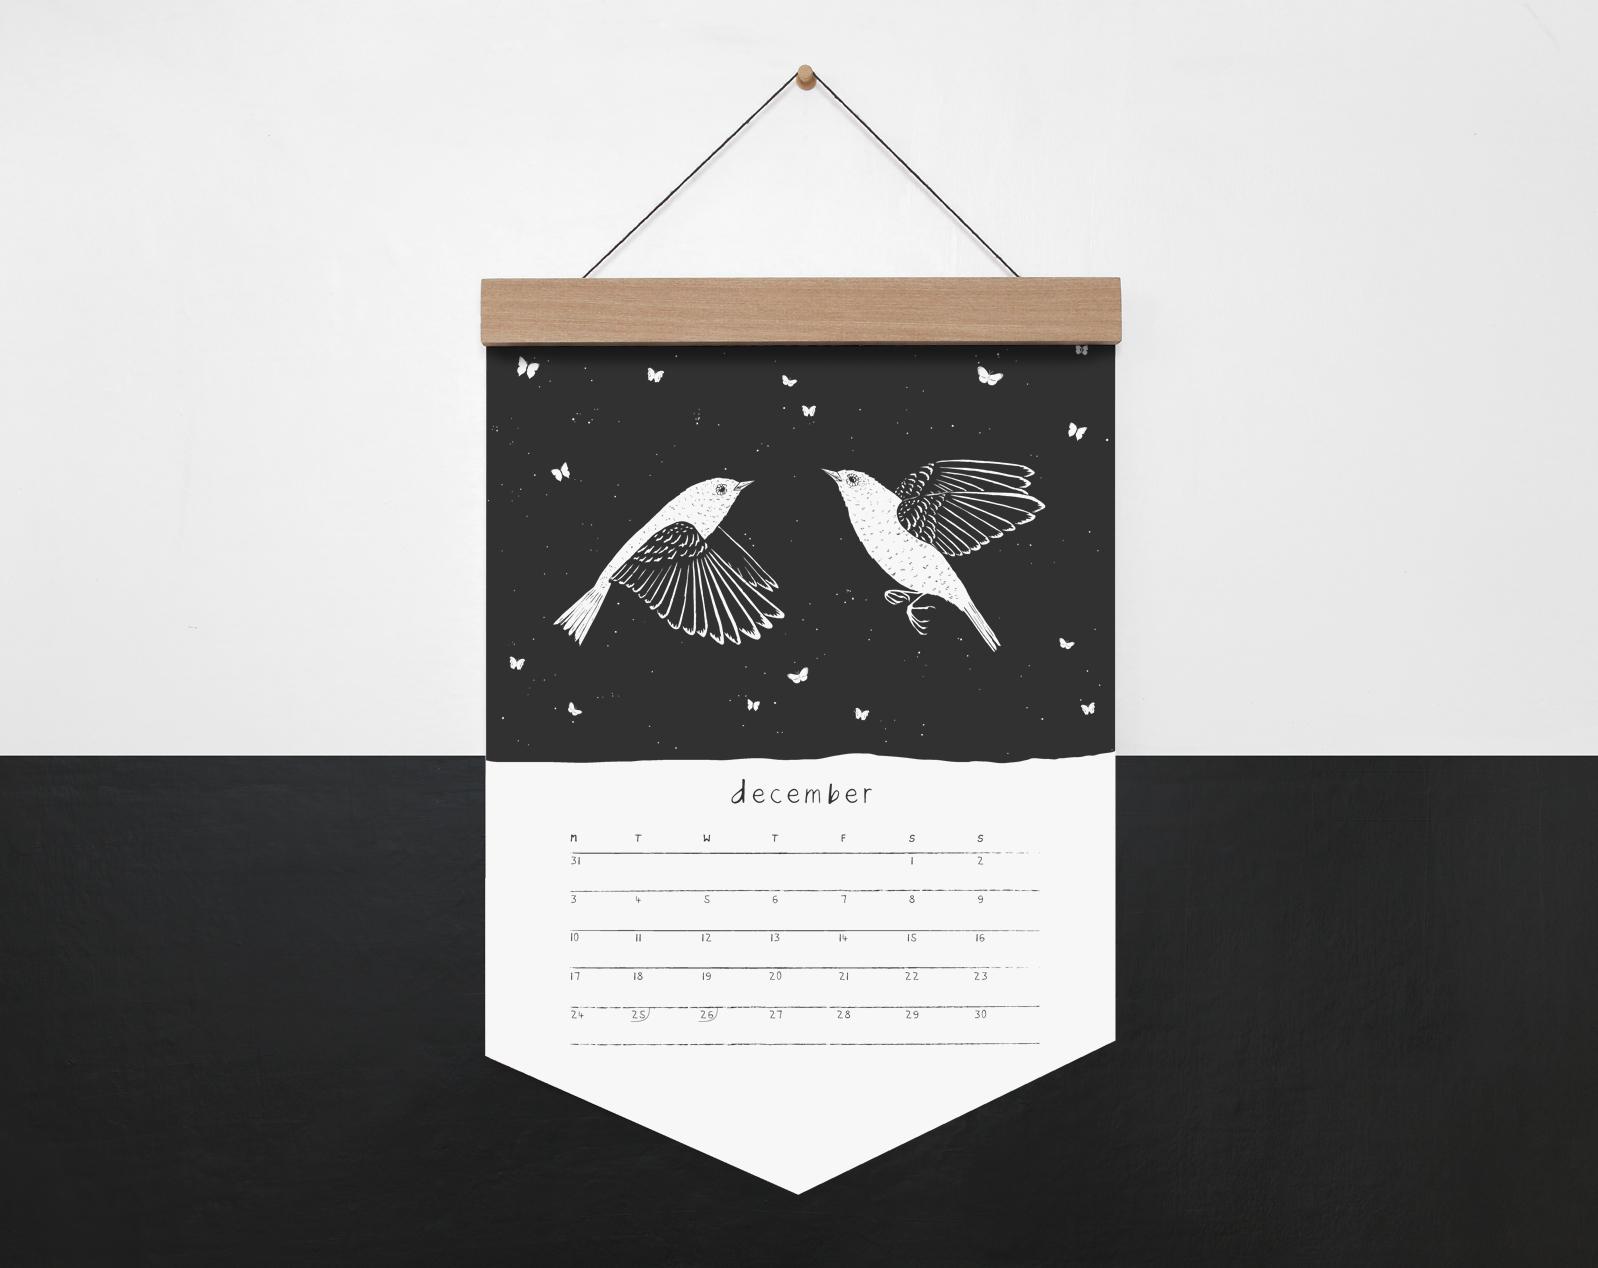 bird-plus-bird-a3-calendar-13.jpg